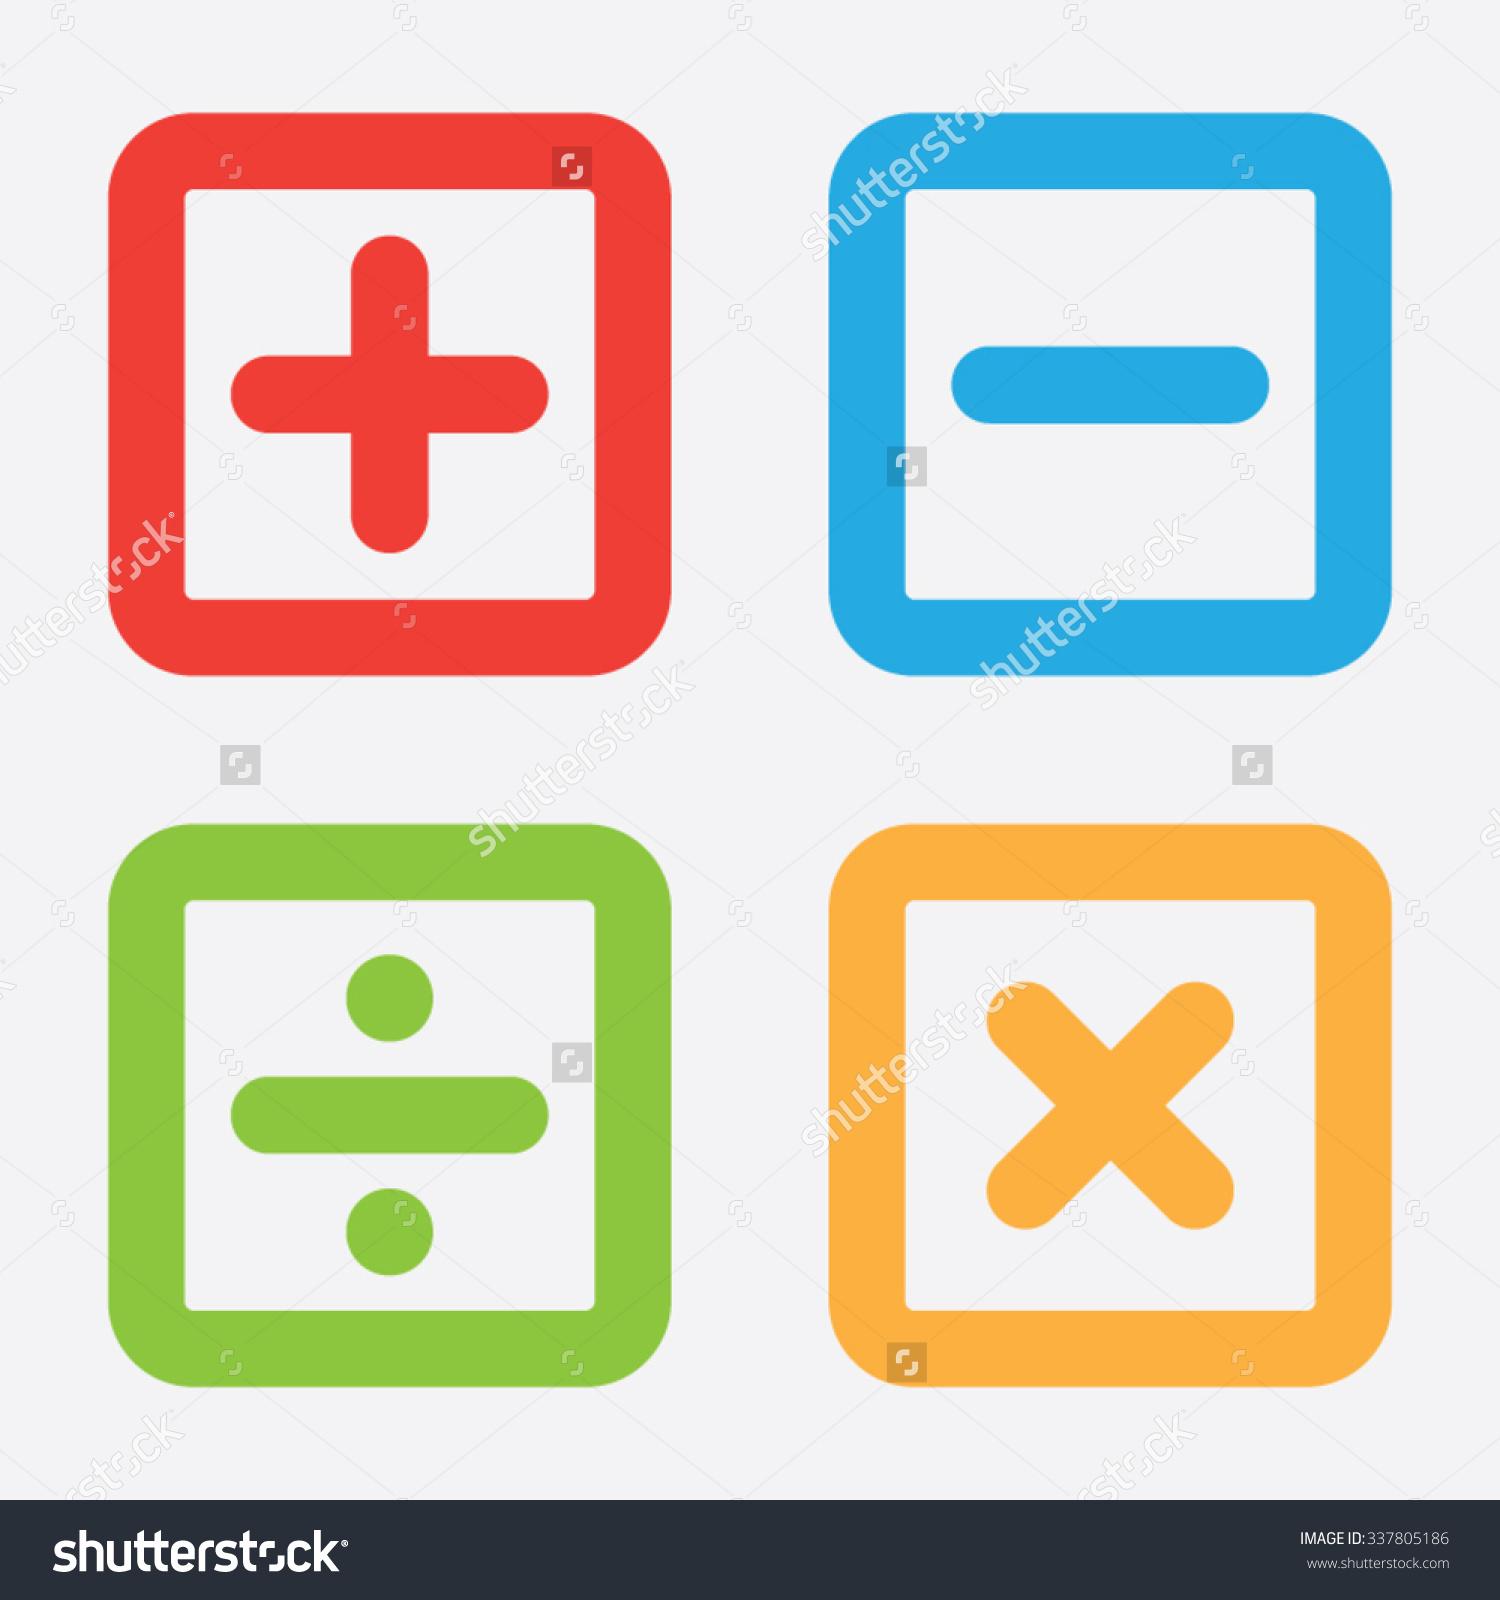 1500x1600 Adding Subtracting Denominator Color School Days Worksheet Answer